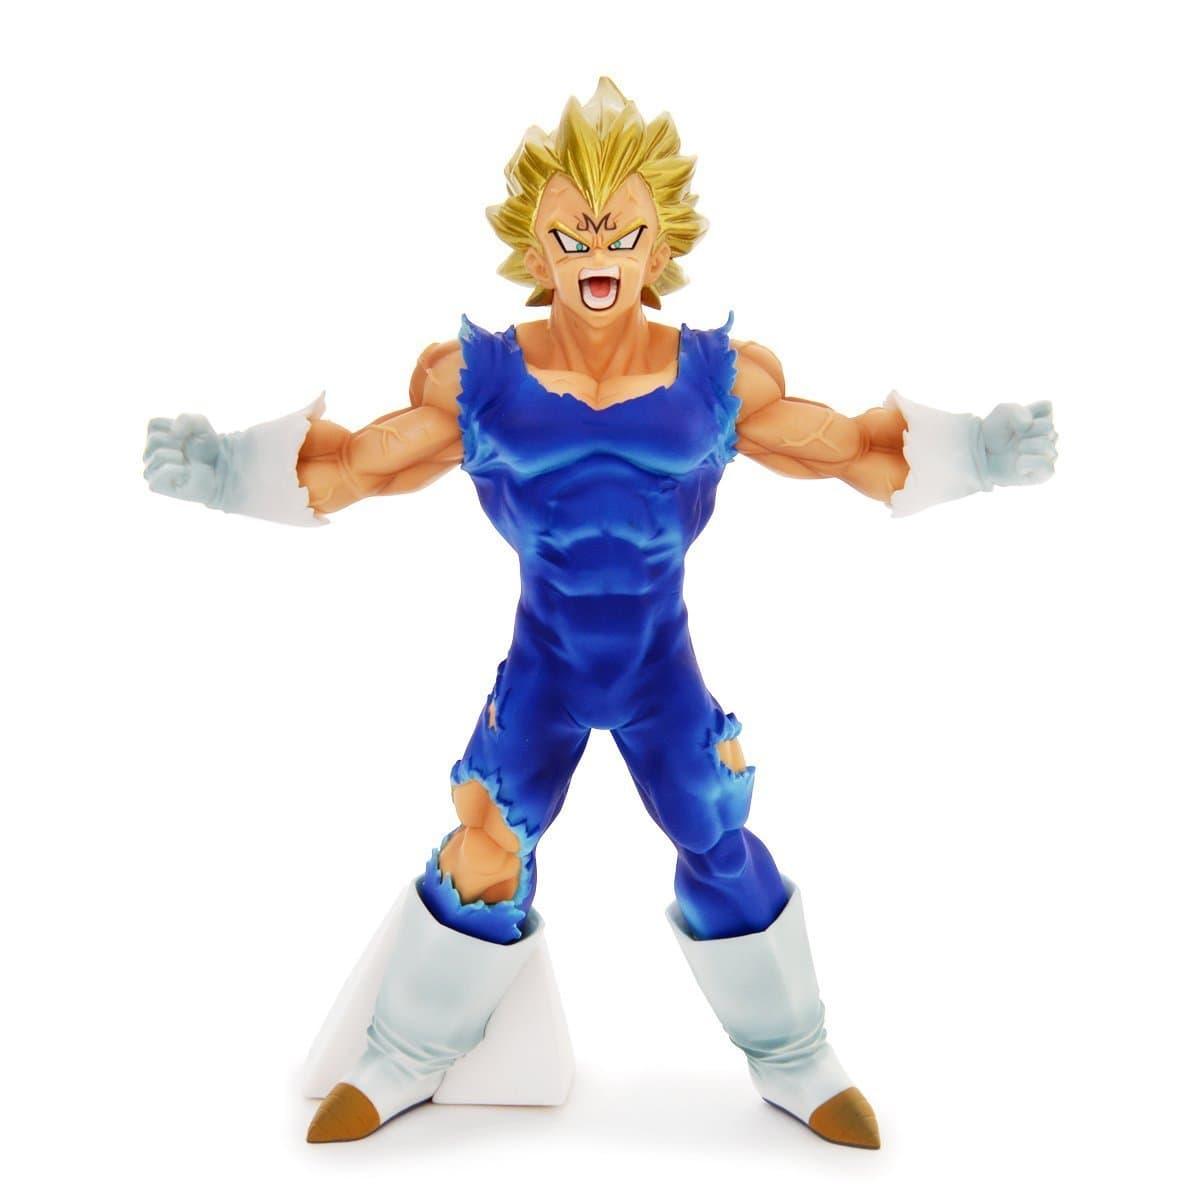 majin vegeta figure